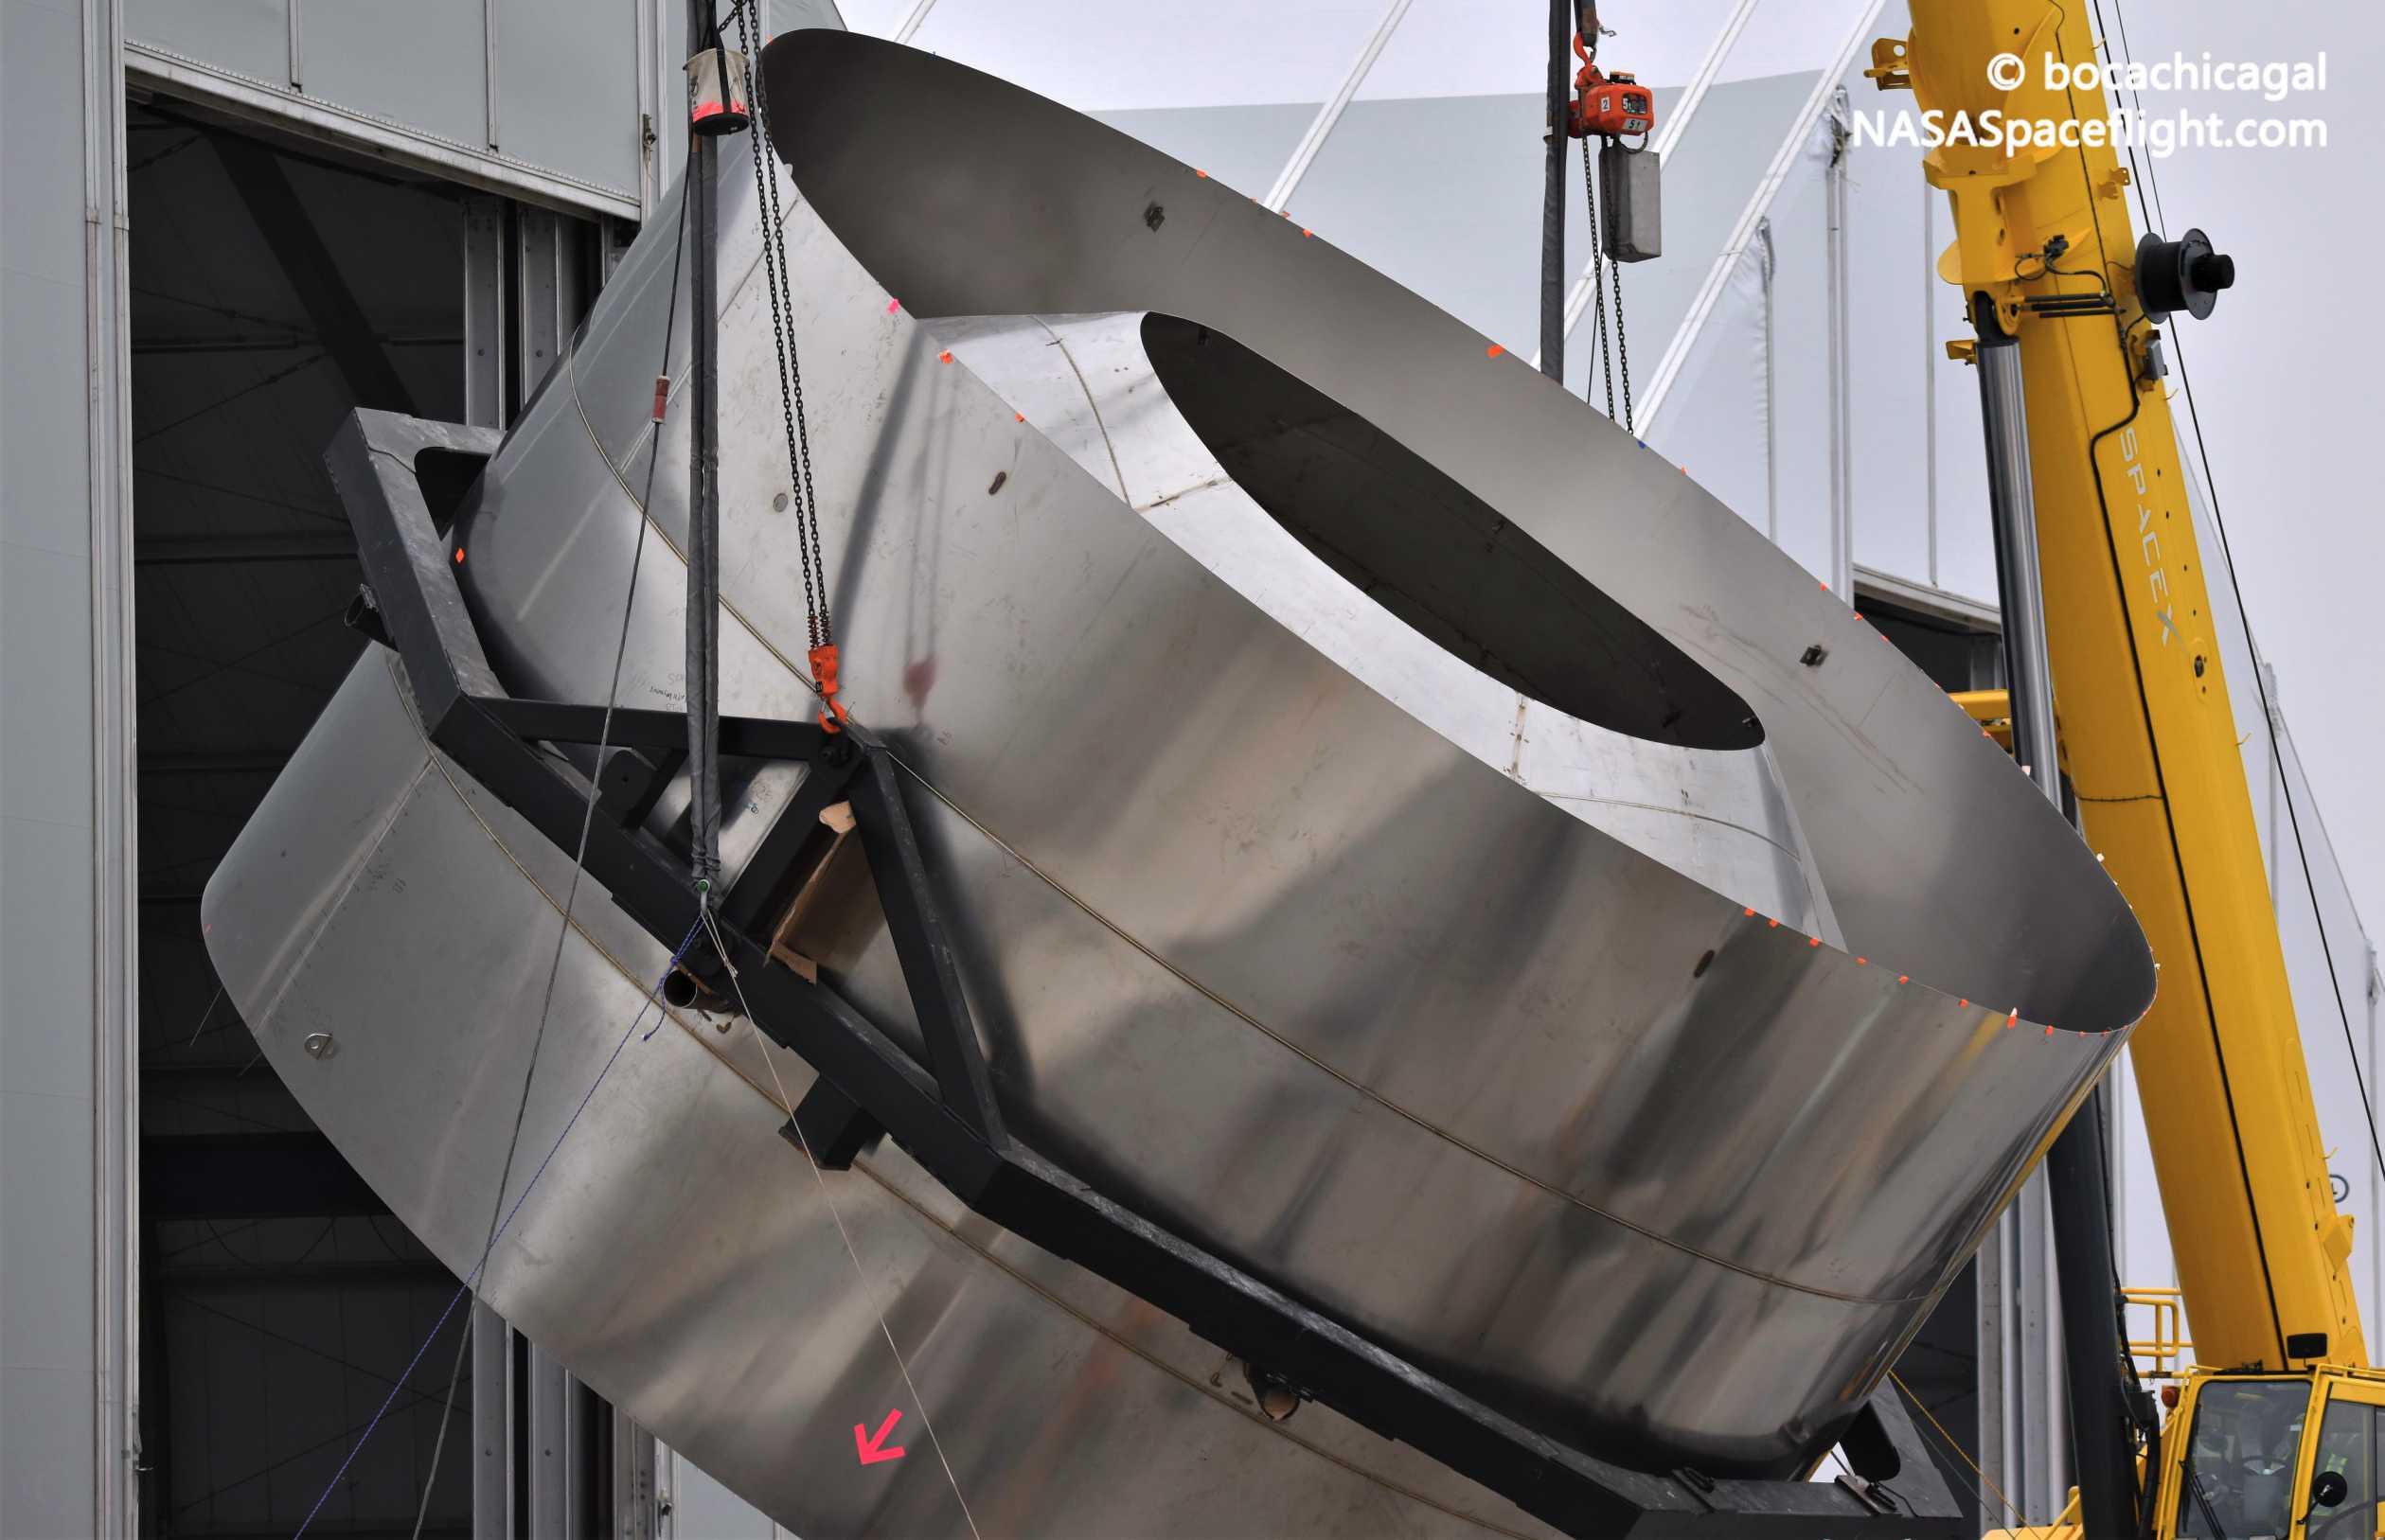 Starship Boca Chica 020920 (NASASpaceflight – bocachicagal) SN01 dome ring flip 3 (c)